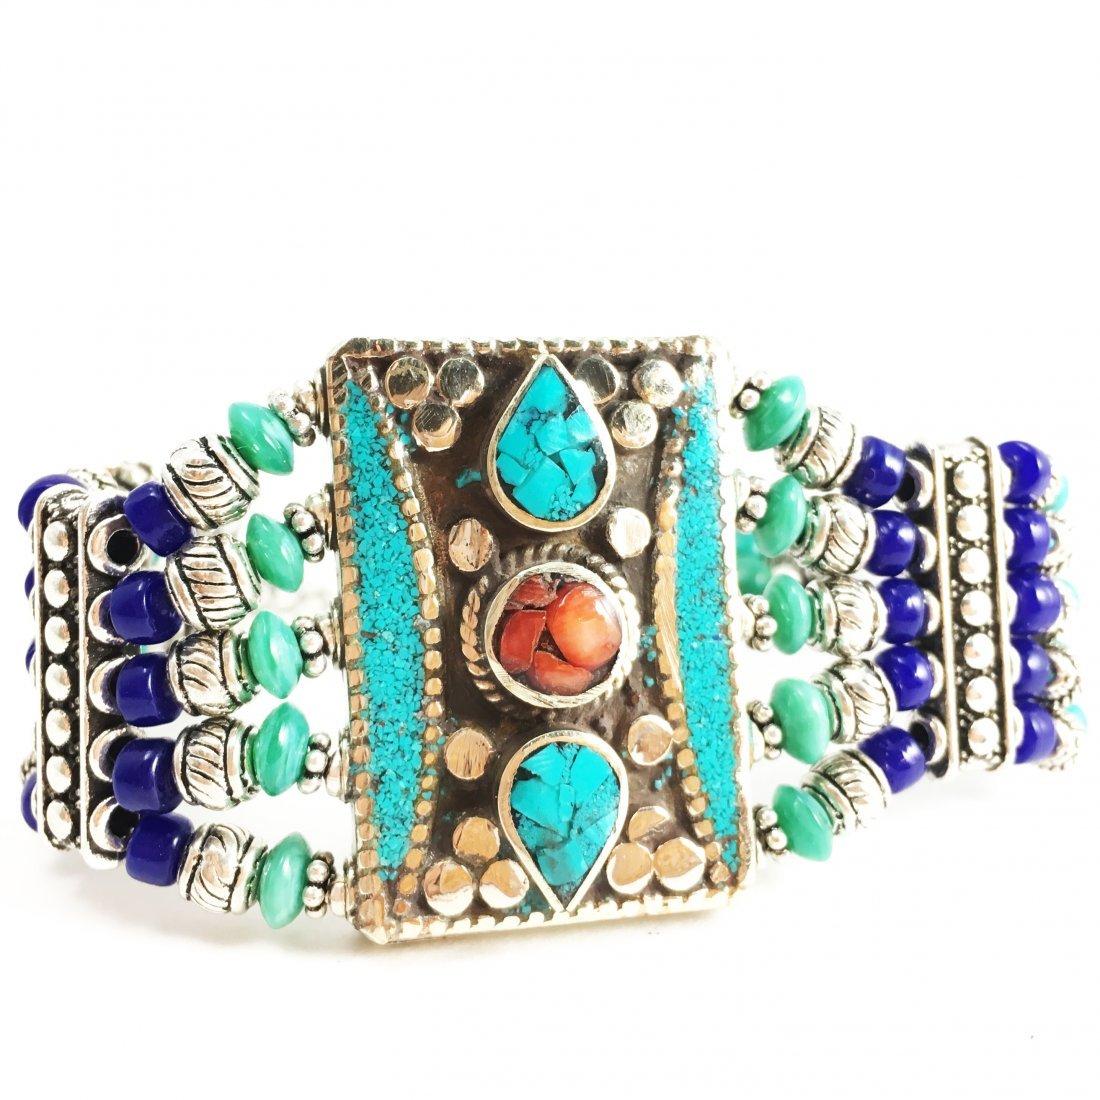 Tibetan Buddhist Turquoise & Coral Vintage Bracelet